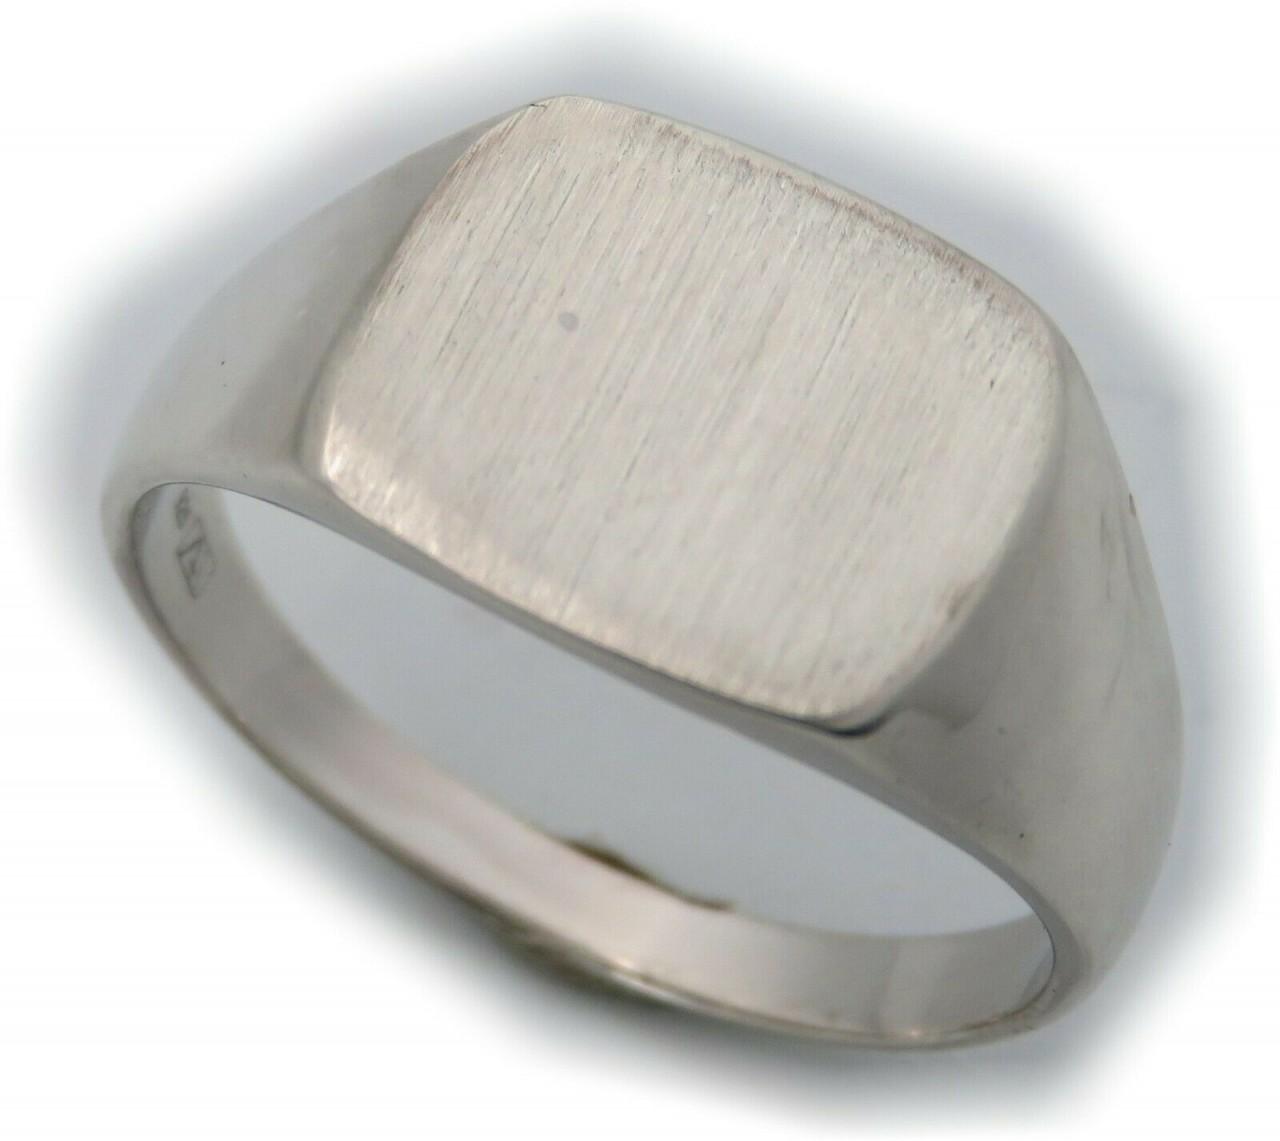 Neu Herren Ring Rechteck Silber 925 Monogrammgravur Sterlingsilber Siegelring